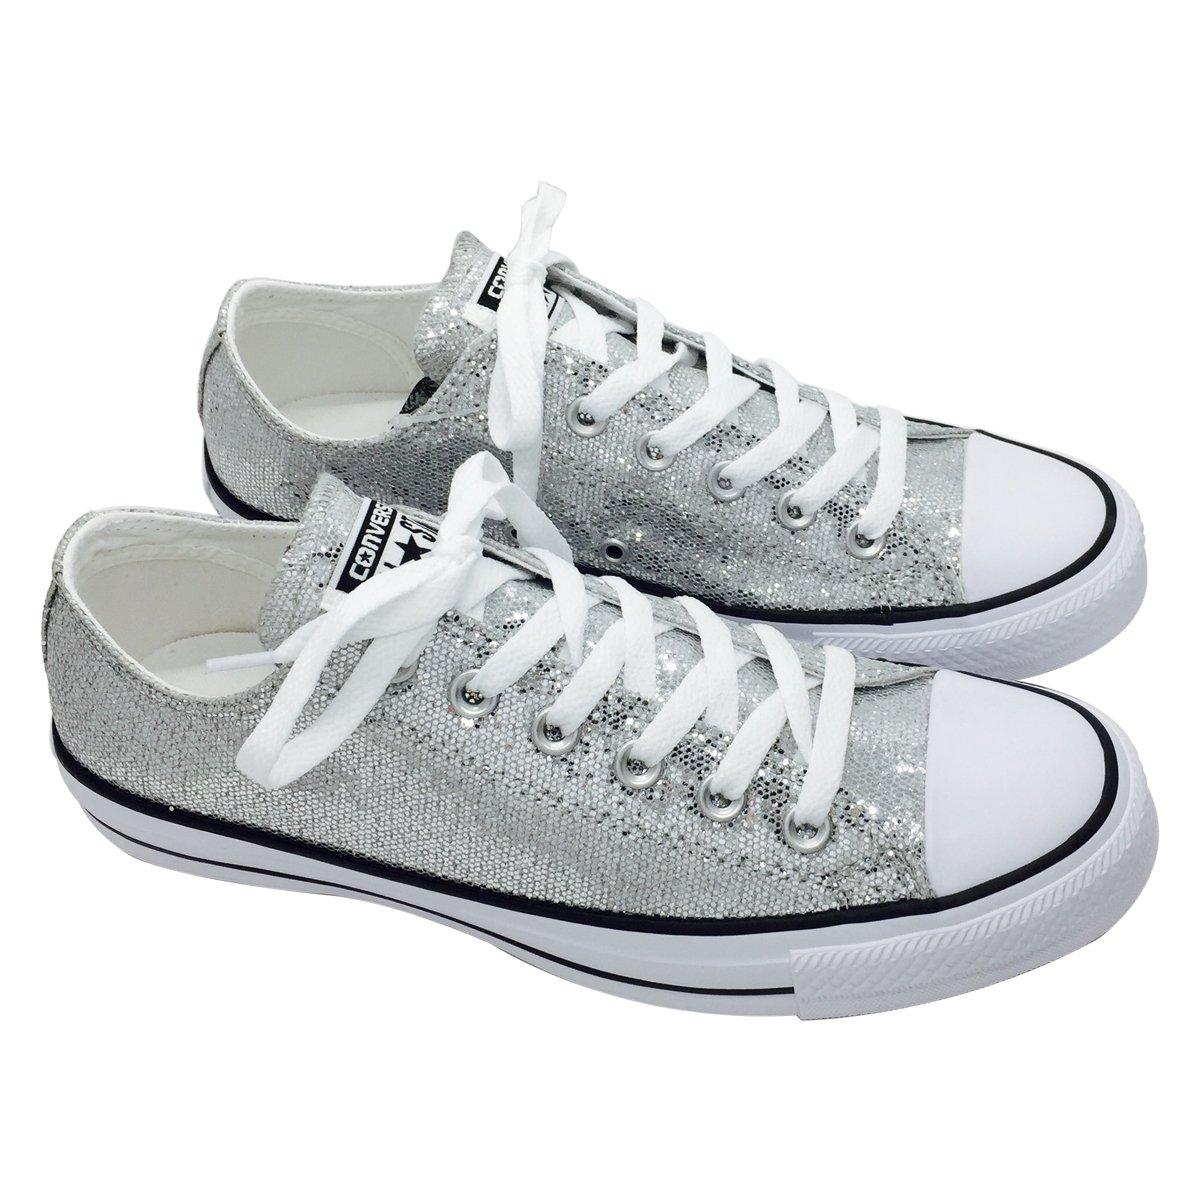 23ef48b6a58d Converse Chuck Taylor All-Star Women's Ox Lo Top Sneakers Silver Glitter  135851C (Womens 10): Amazon.ca: Shoes & Handbags